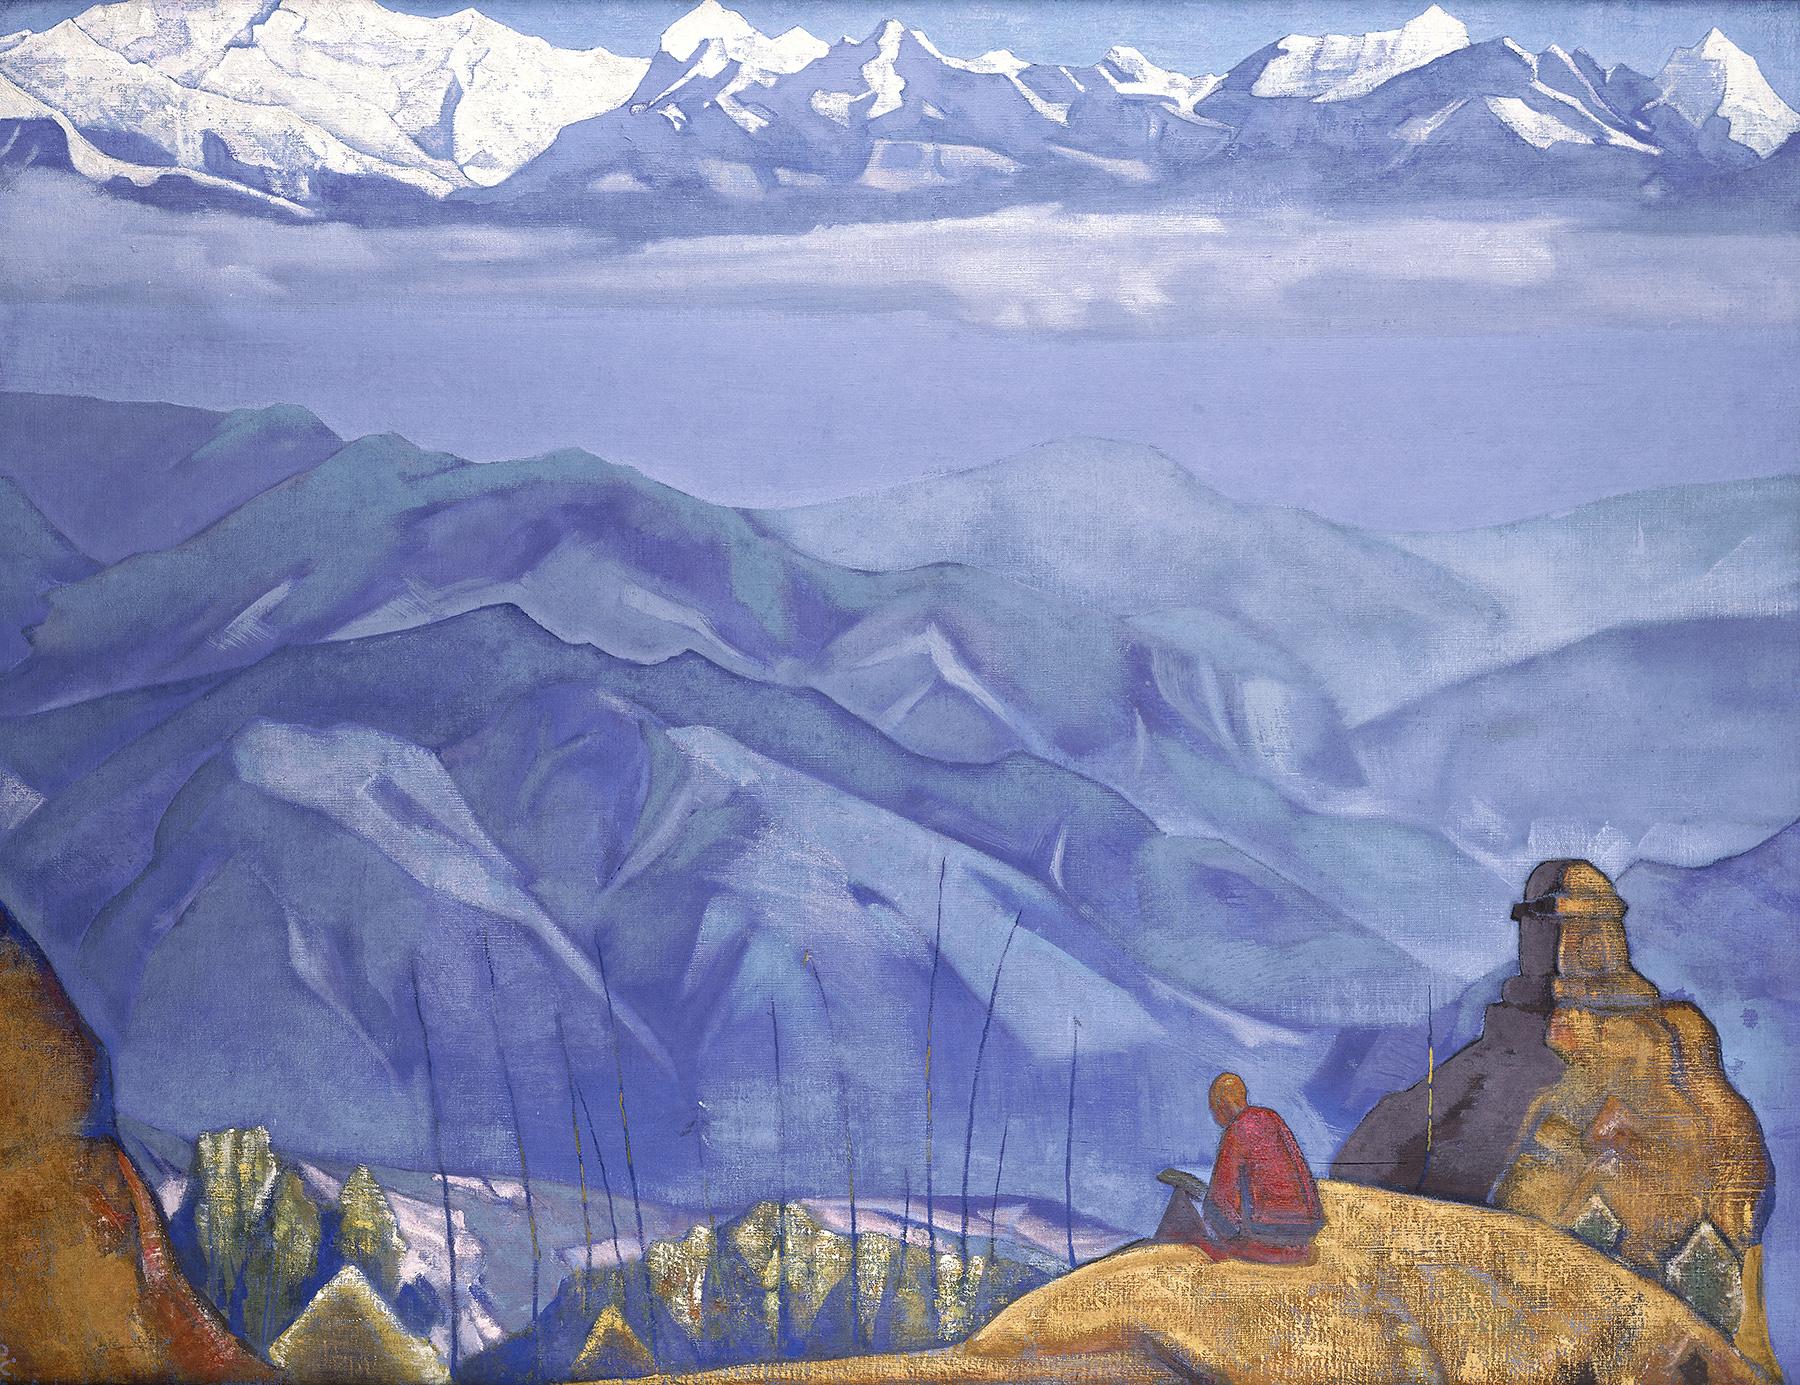 Book of Wisdom, 1924 - Nicholas Roerich - WikiArt.org